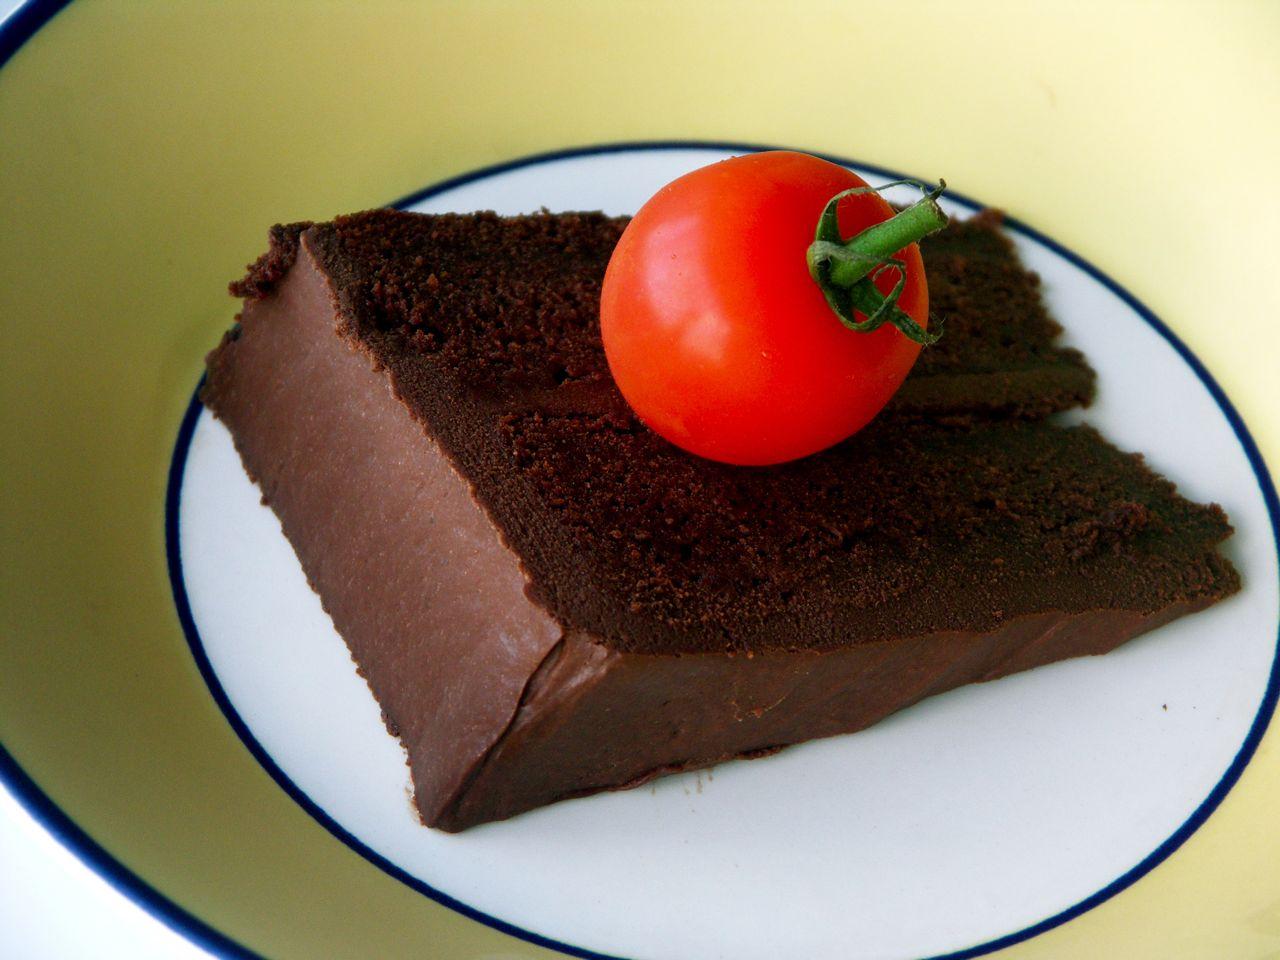 Rose Beranbaum Chocolate Cake